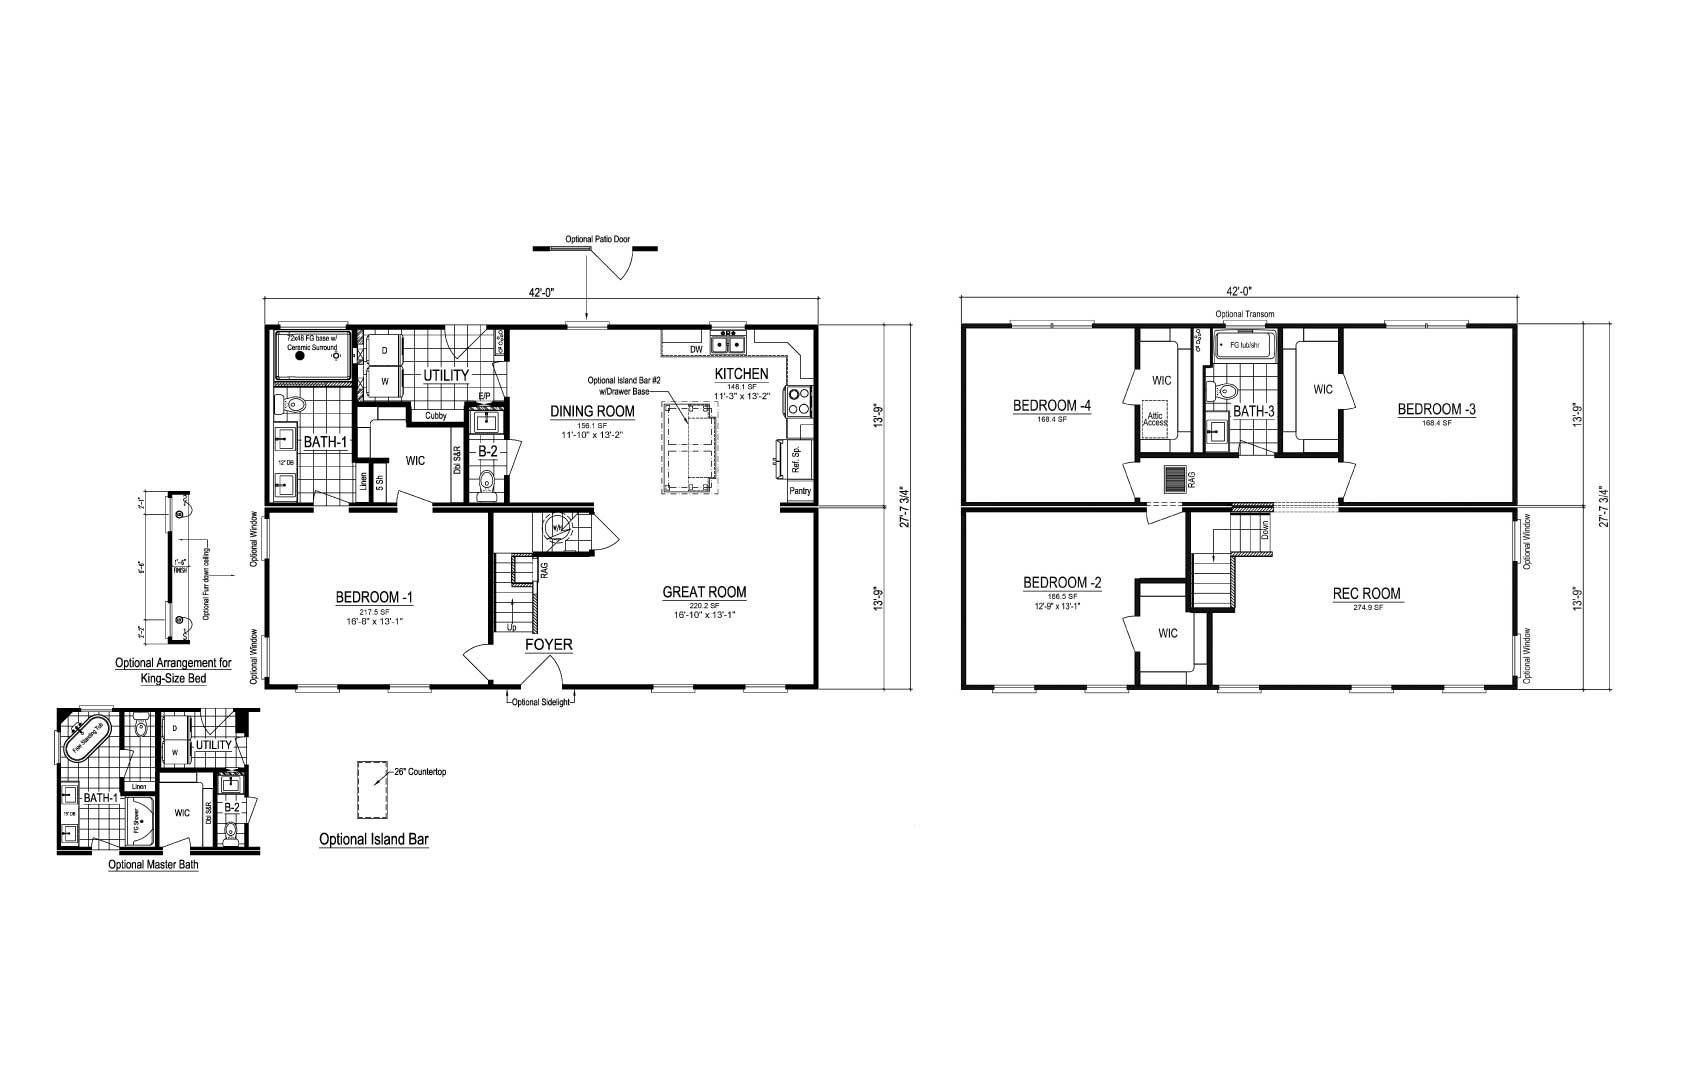 Homestead VII Two Story Modular Home Floor Plan